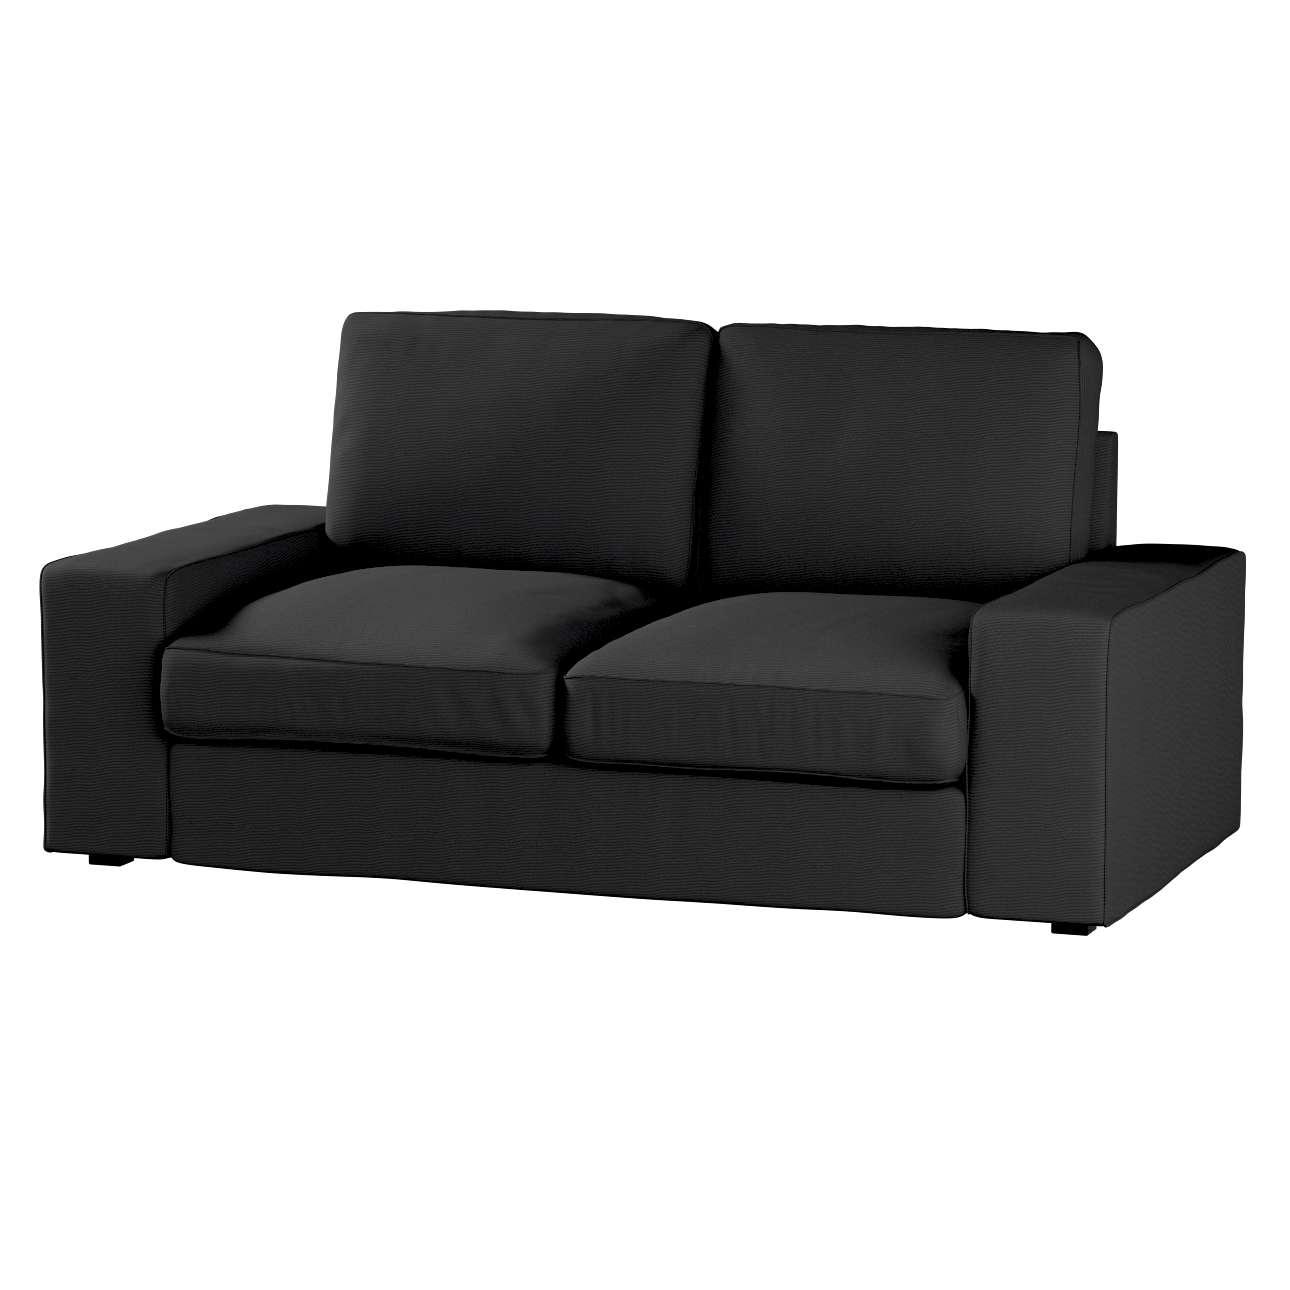 Kivik 2-Sitzer Sofabezug Sofa Kivik 2-Sitzer von der Kollektion Etna, Stoff: 705-00